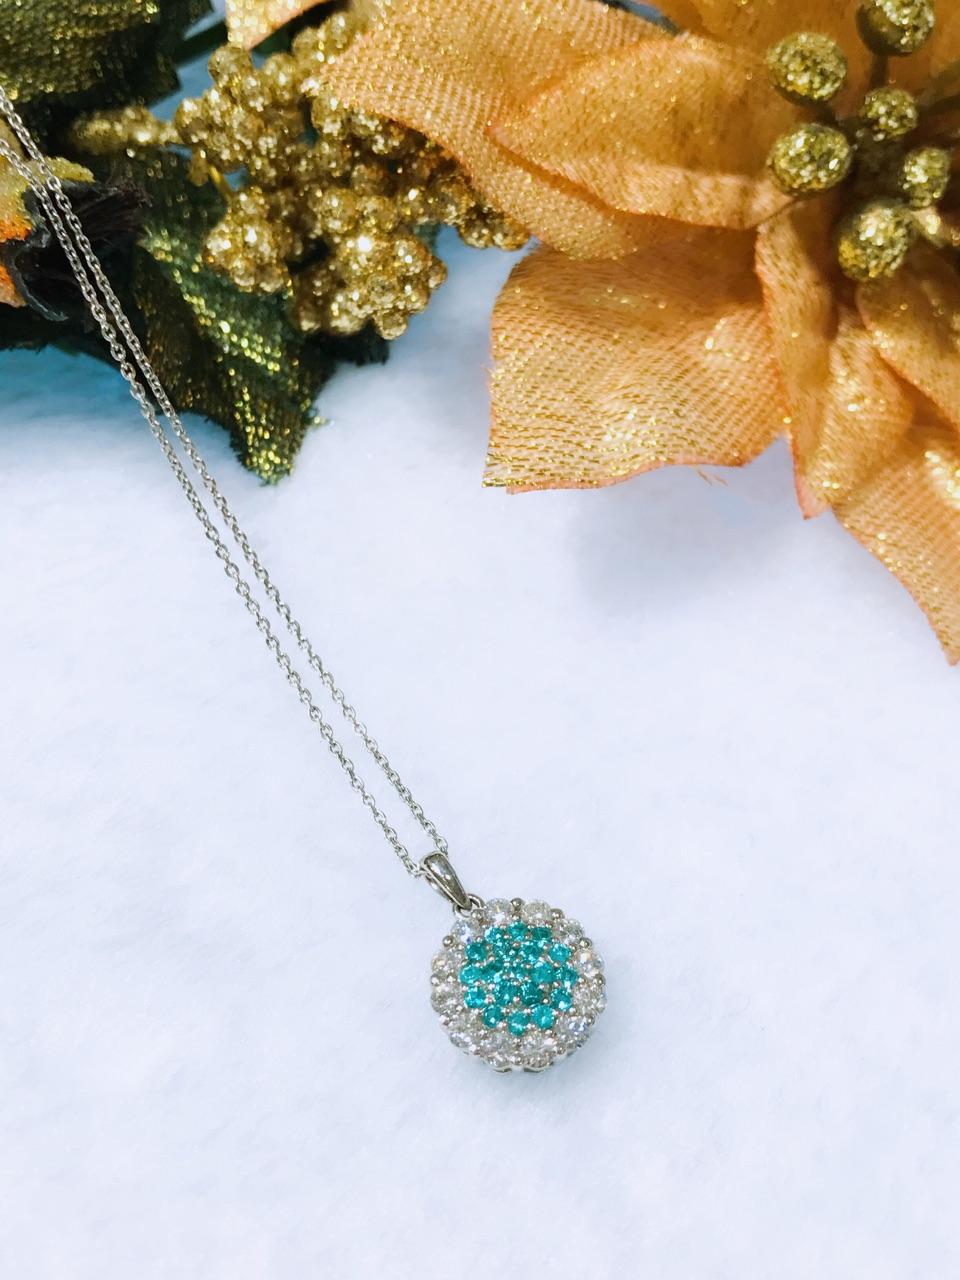 PT900 0.19ct Paraiba Tourmaline with 0.40ct Side Diamonds Necklace